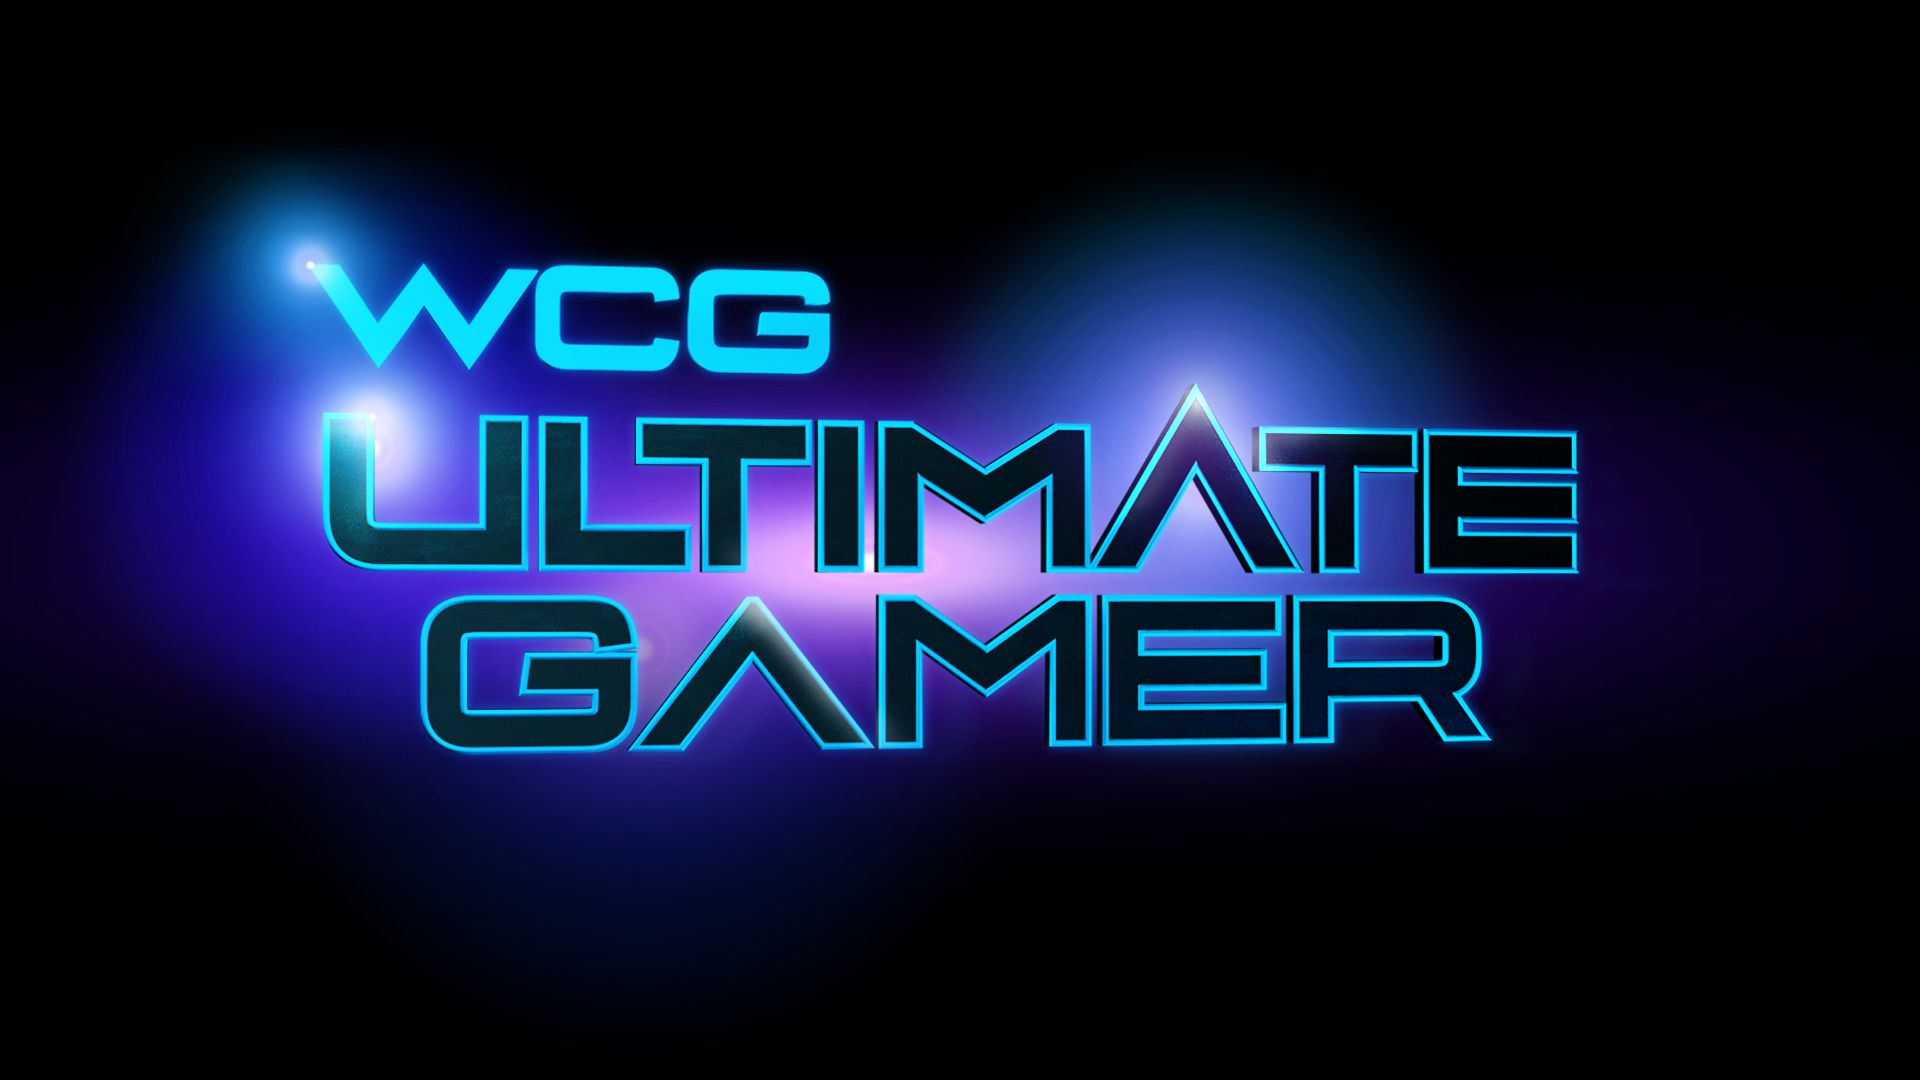 Wcg Ultimate Gamer 2009 2010 Ultimate Games Games Game